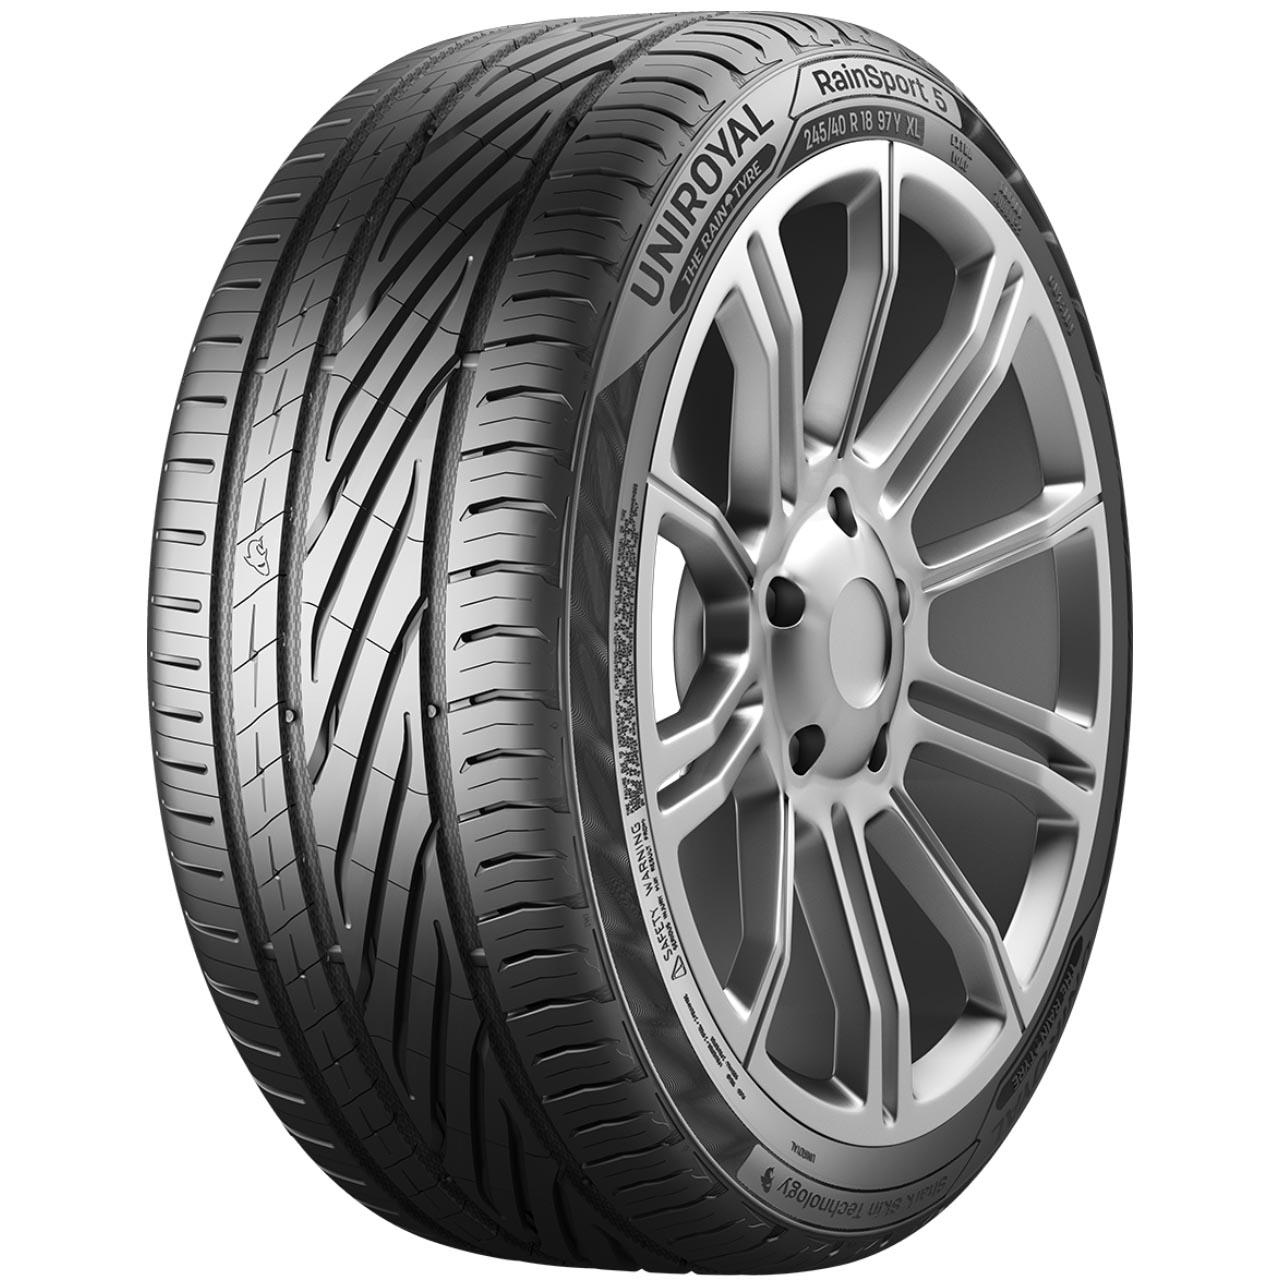 Uniroyal Rainsport 5 205/55R16 91W